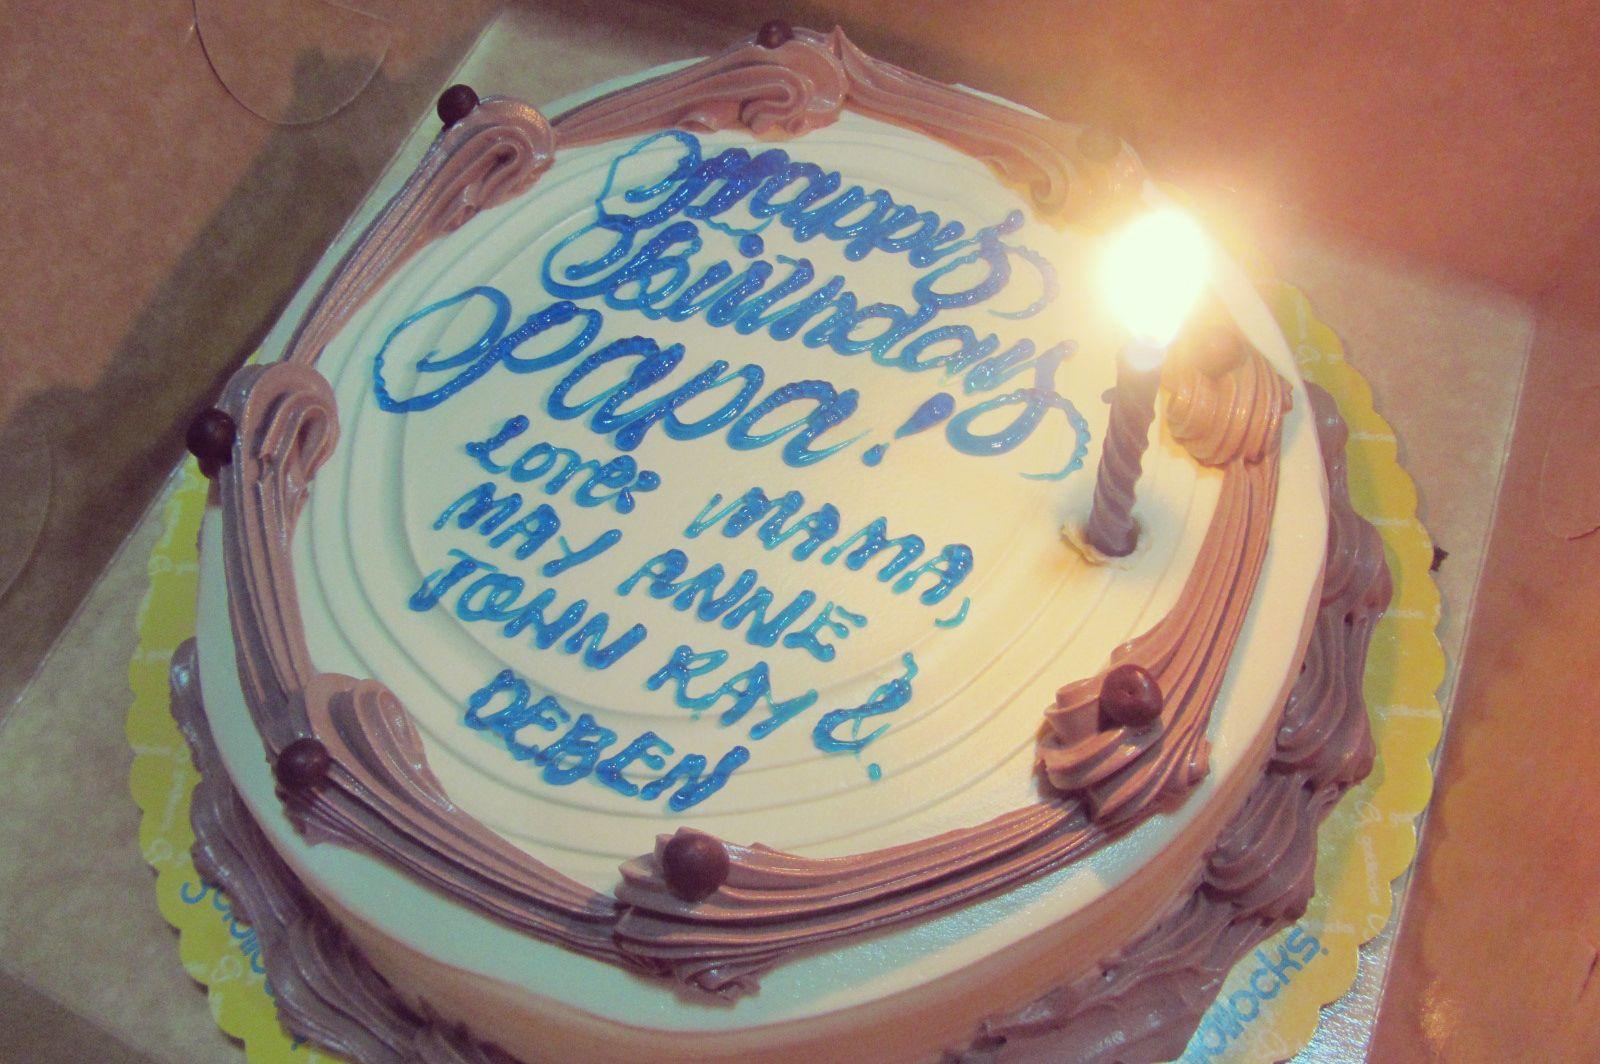 Images Of Papa Birthday Cake : Happy Birthday Papa Cake 26745wall.JPG Happy Birthday ...